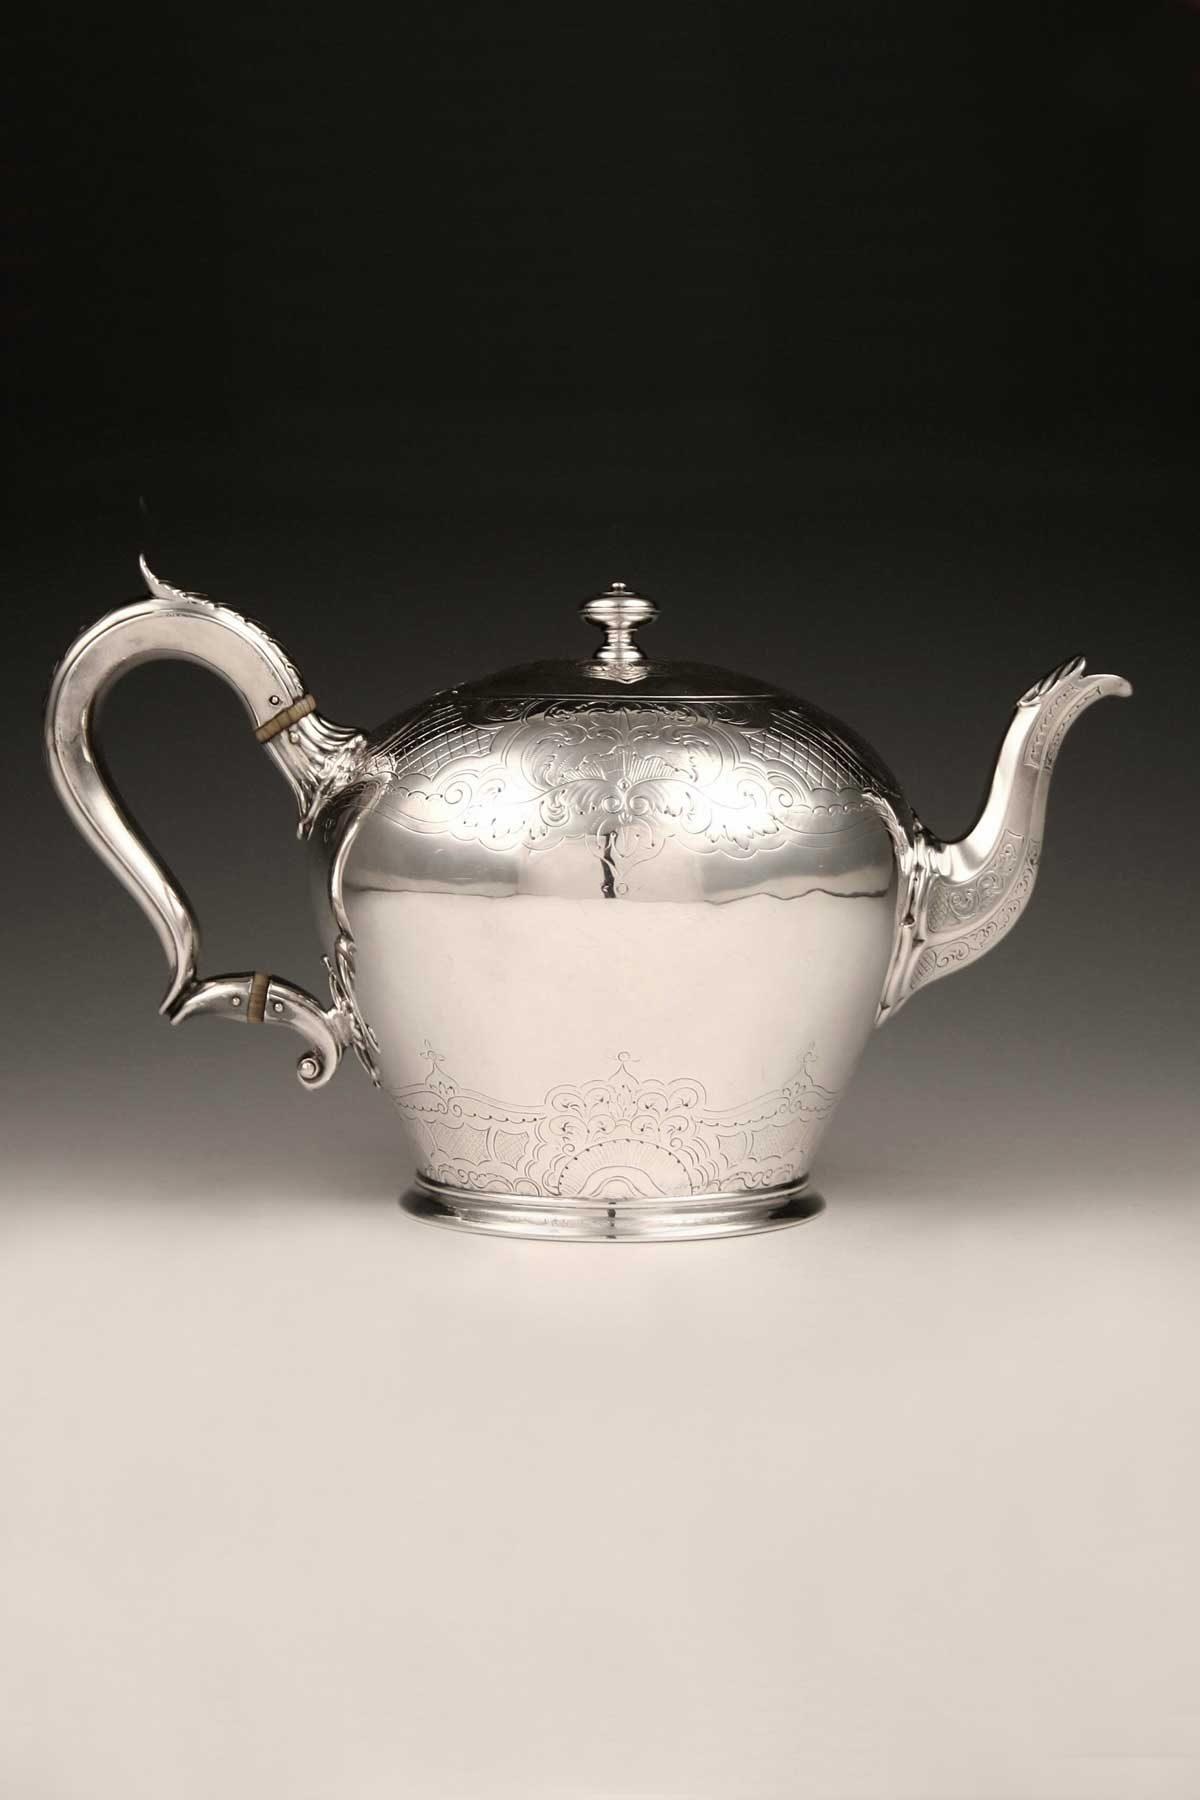 William_IV_Teekanne_Sterling_Silber_Teapot_sterling_silver_ezüst_argent_plata_sølv_T